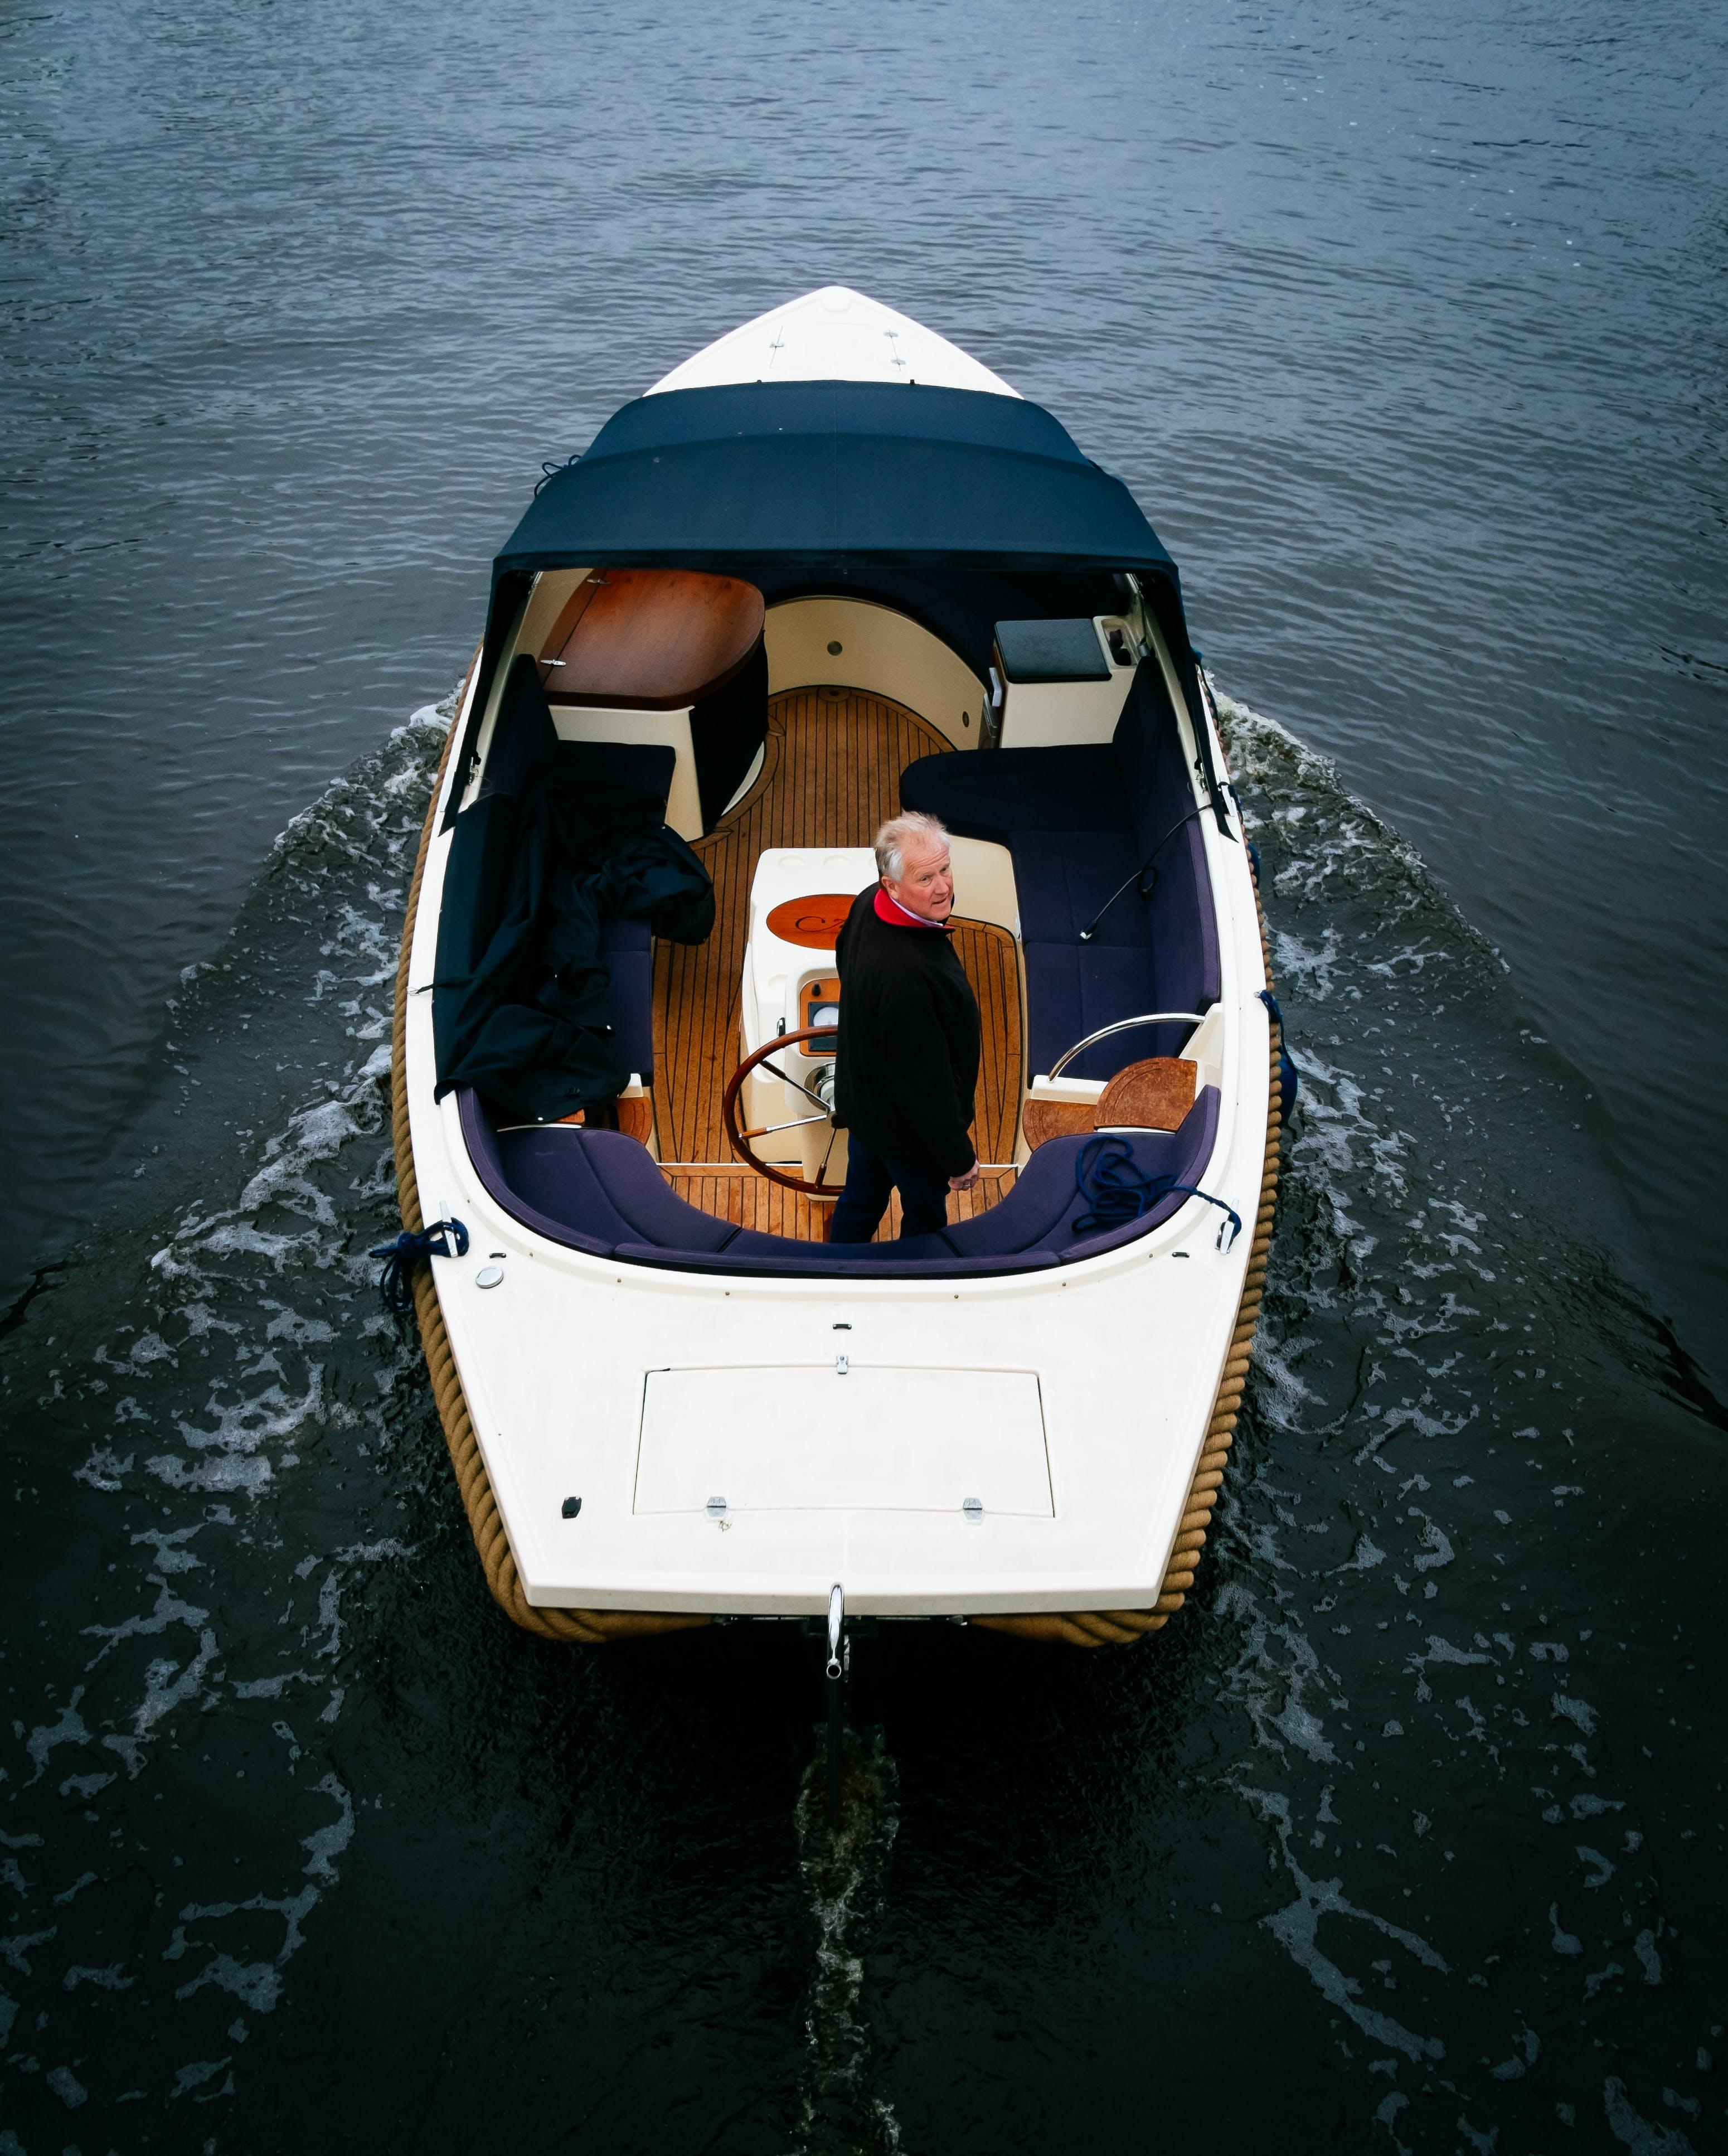 Free stock photo of sea, man, boat, ship